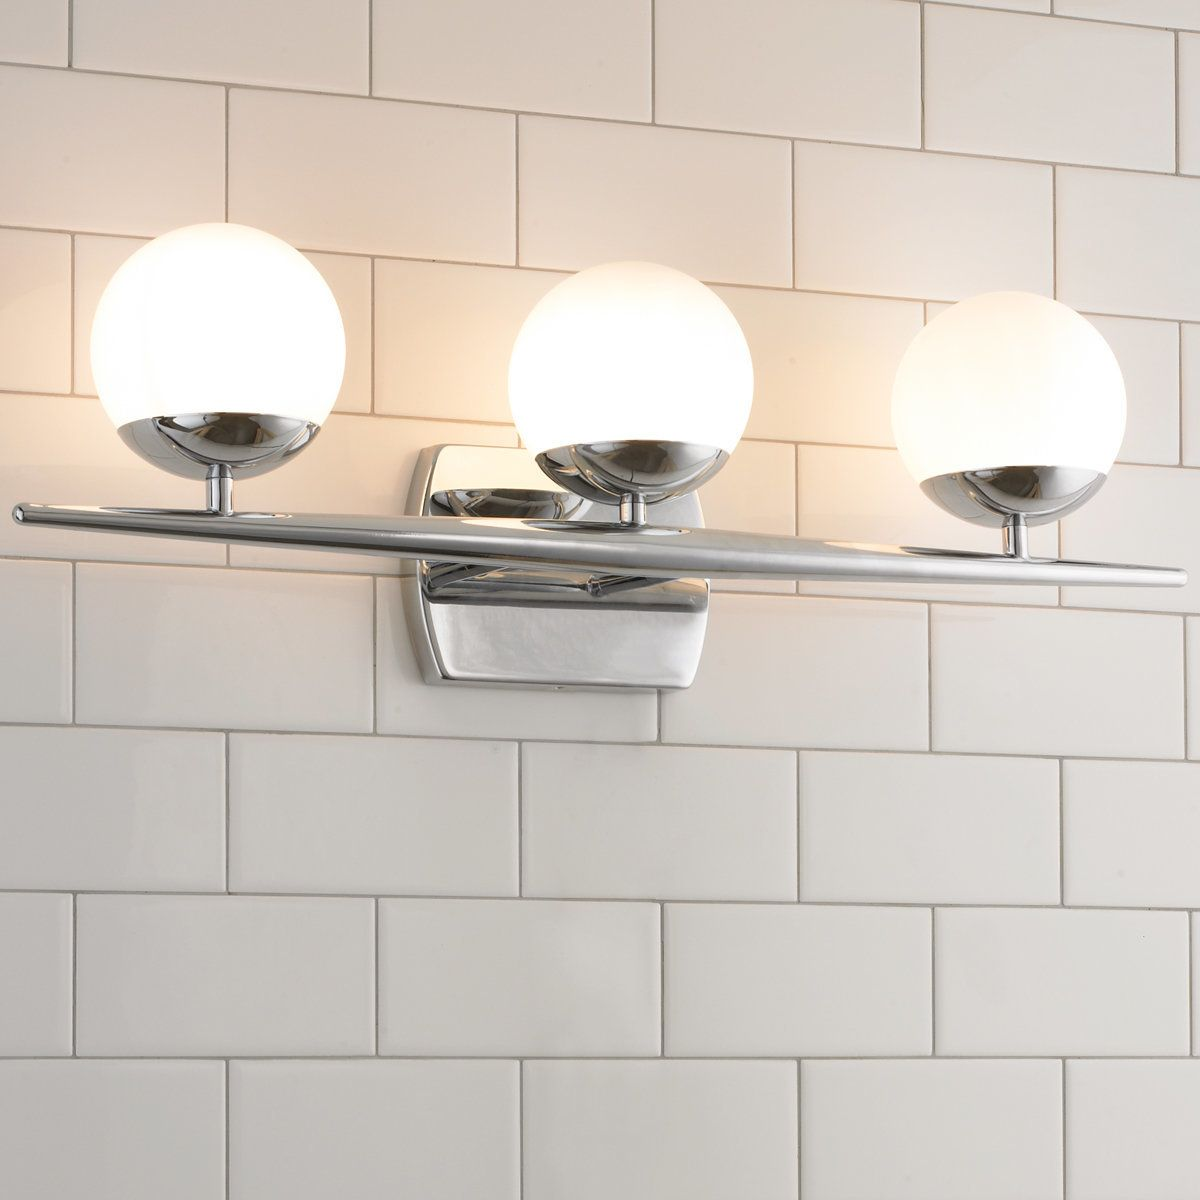 Linear Globe Bath Light 3 Light In 2021 Contemporary Bathroom Lighting Bath Light Bathroom Light Fixtures